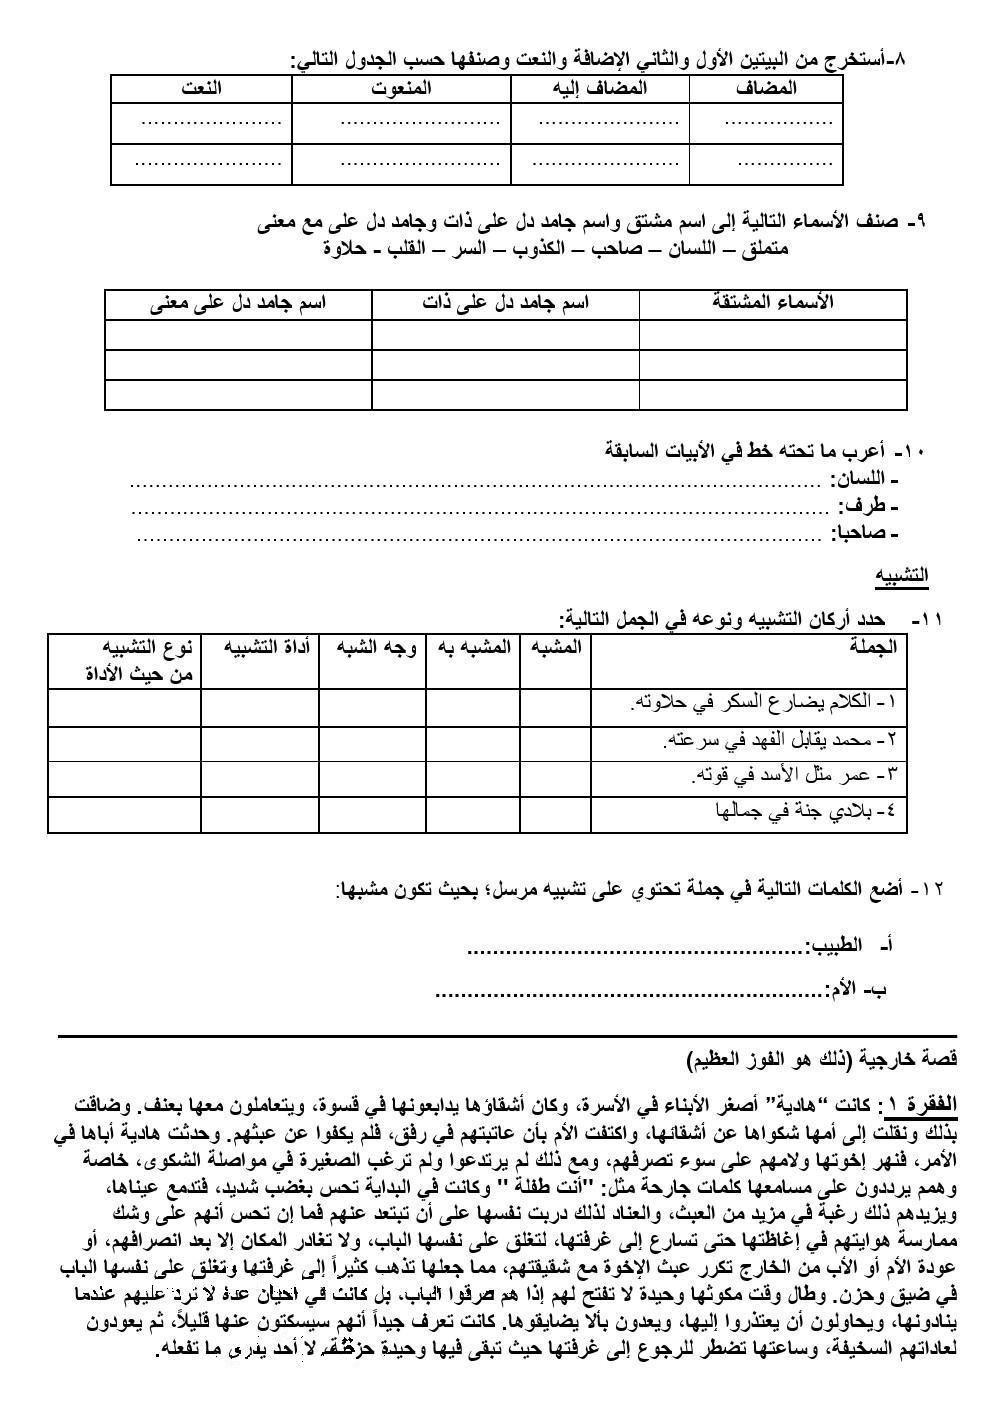 "Heating Curve Worksheet Answers امتحان تجريبي في اللغة العربية للصف اÙ""Ø Ø§Ù…Ù† الفصل الدراسي"